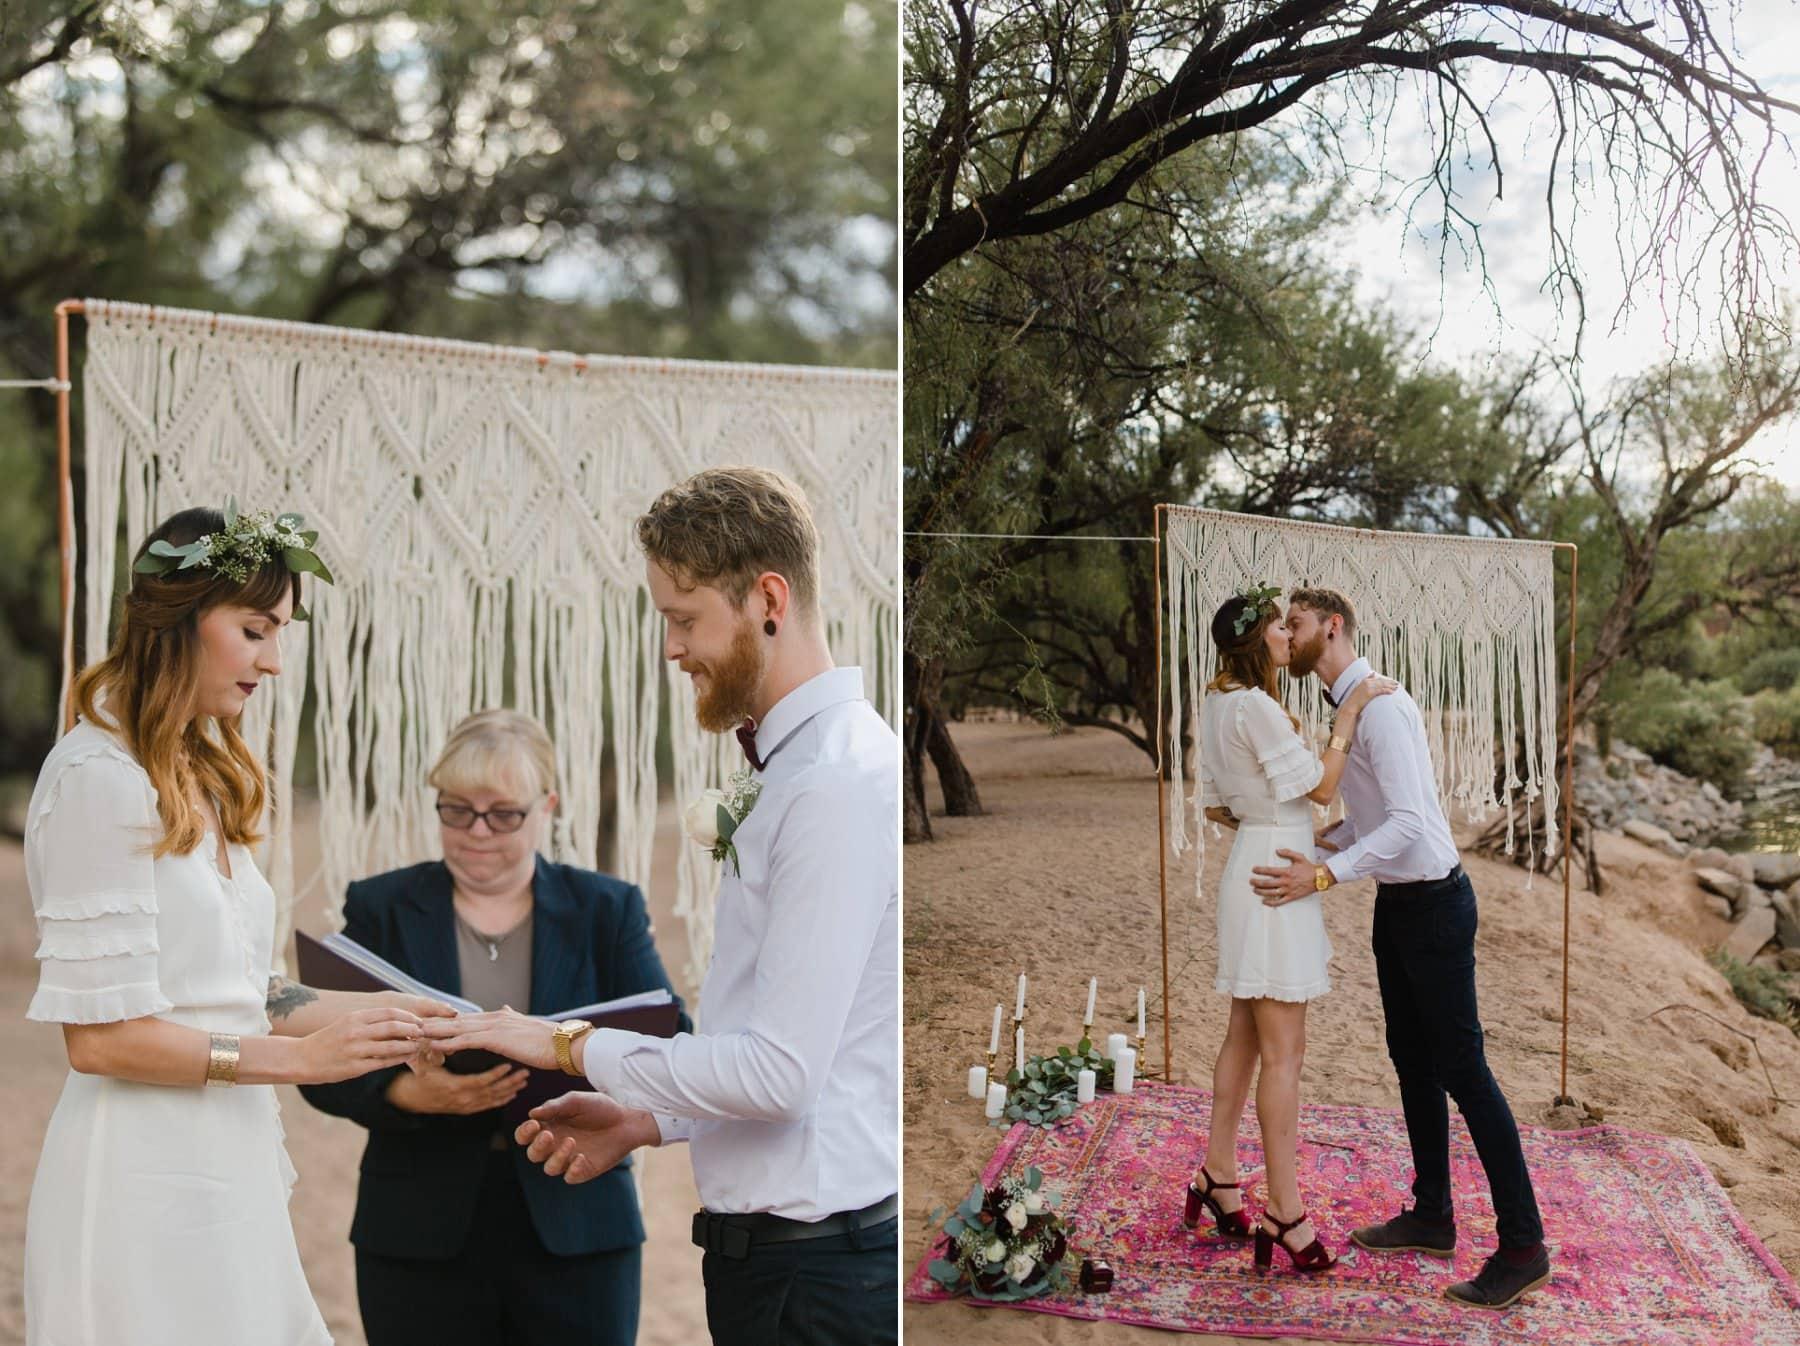 cute boho ceremony Arizona with macrame backdrop and rugs